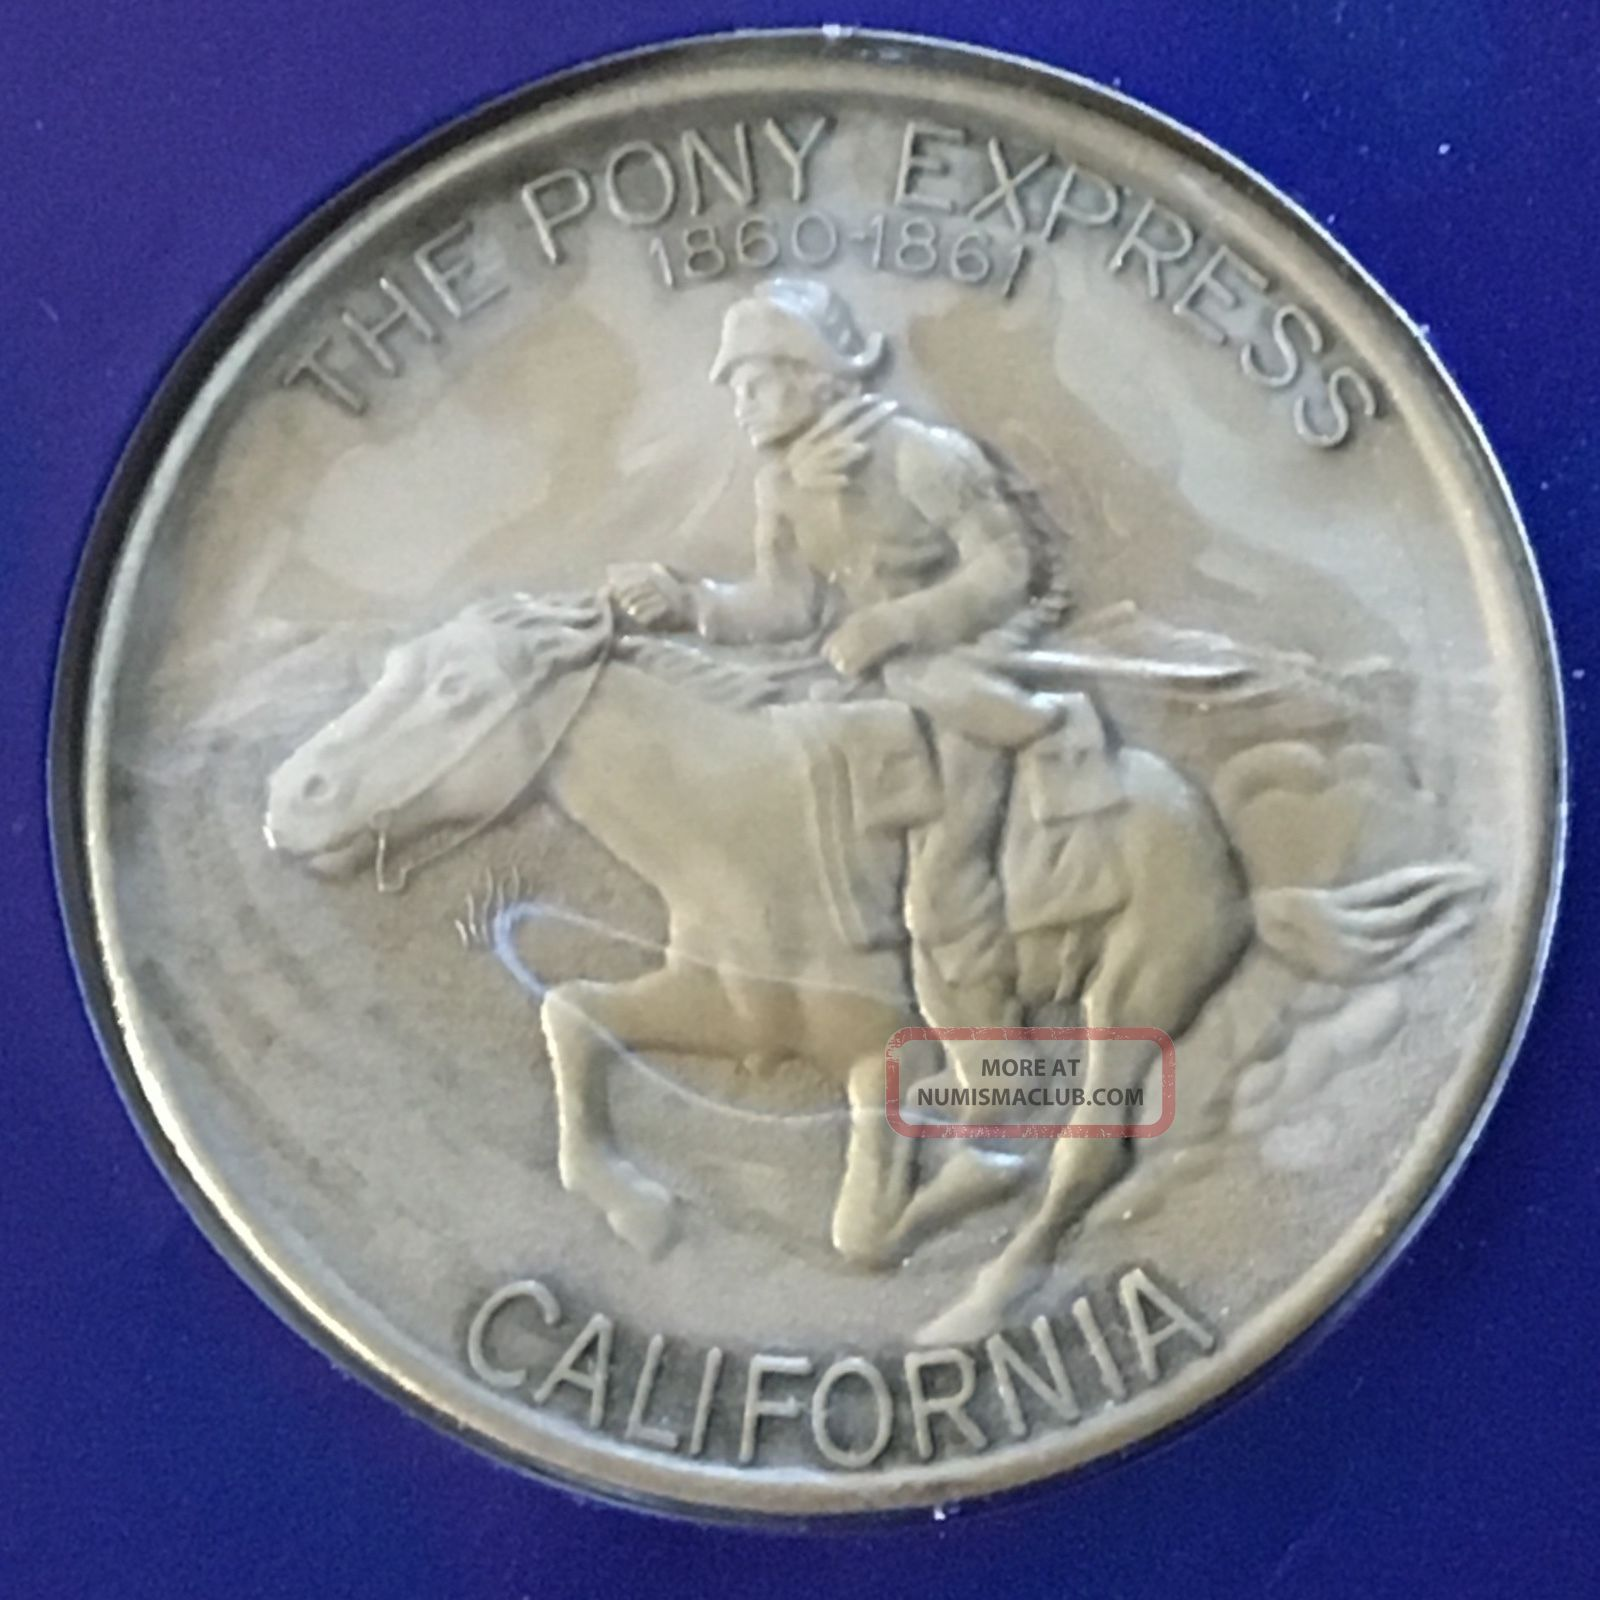 California Medallion,  American Revolution Bicentennial 1975,  Pony Express (box1) Exonumia photo